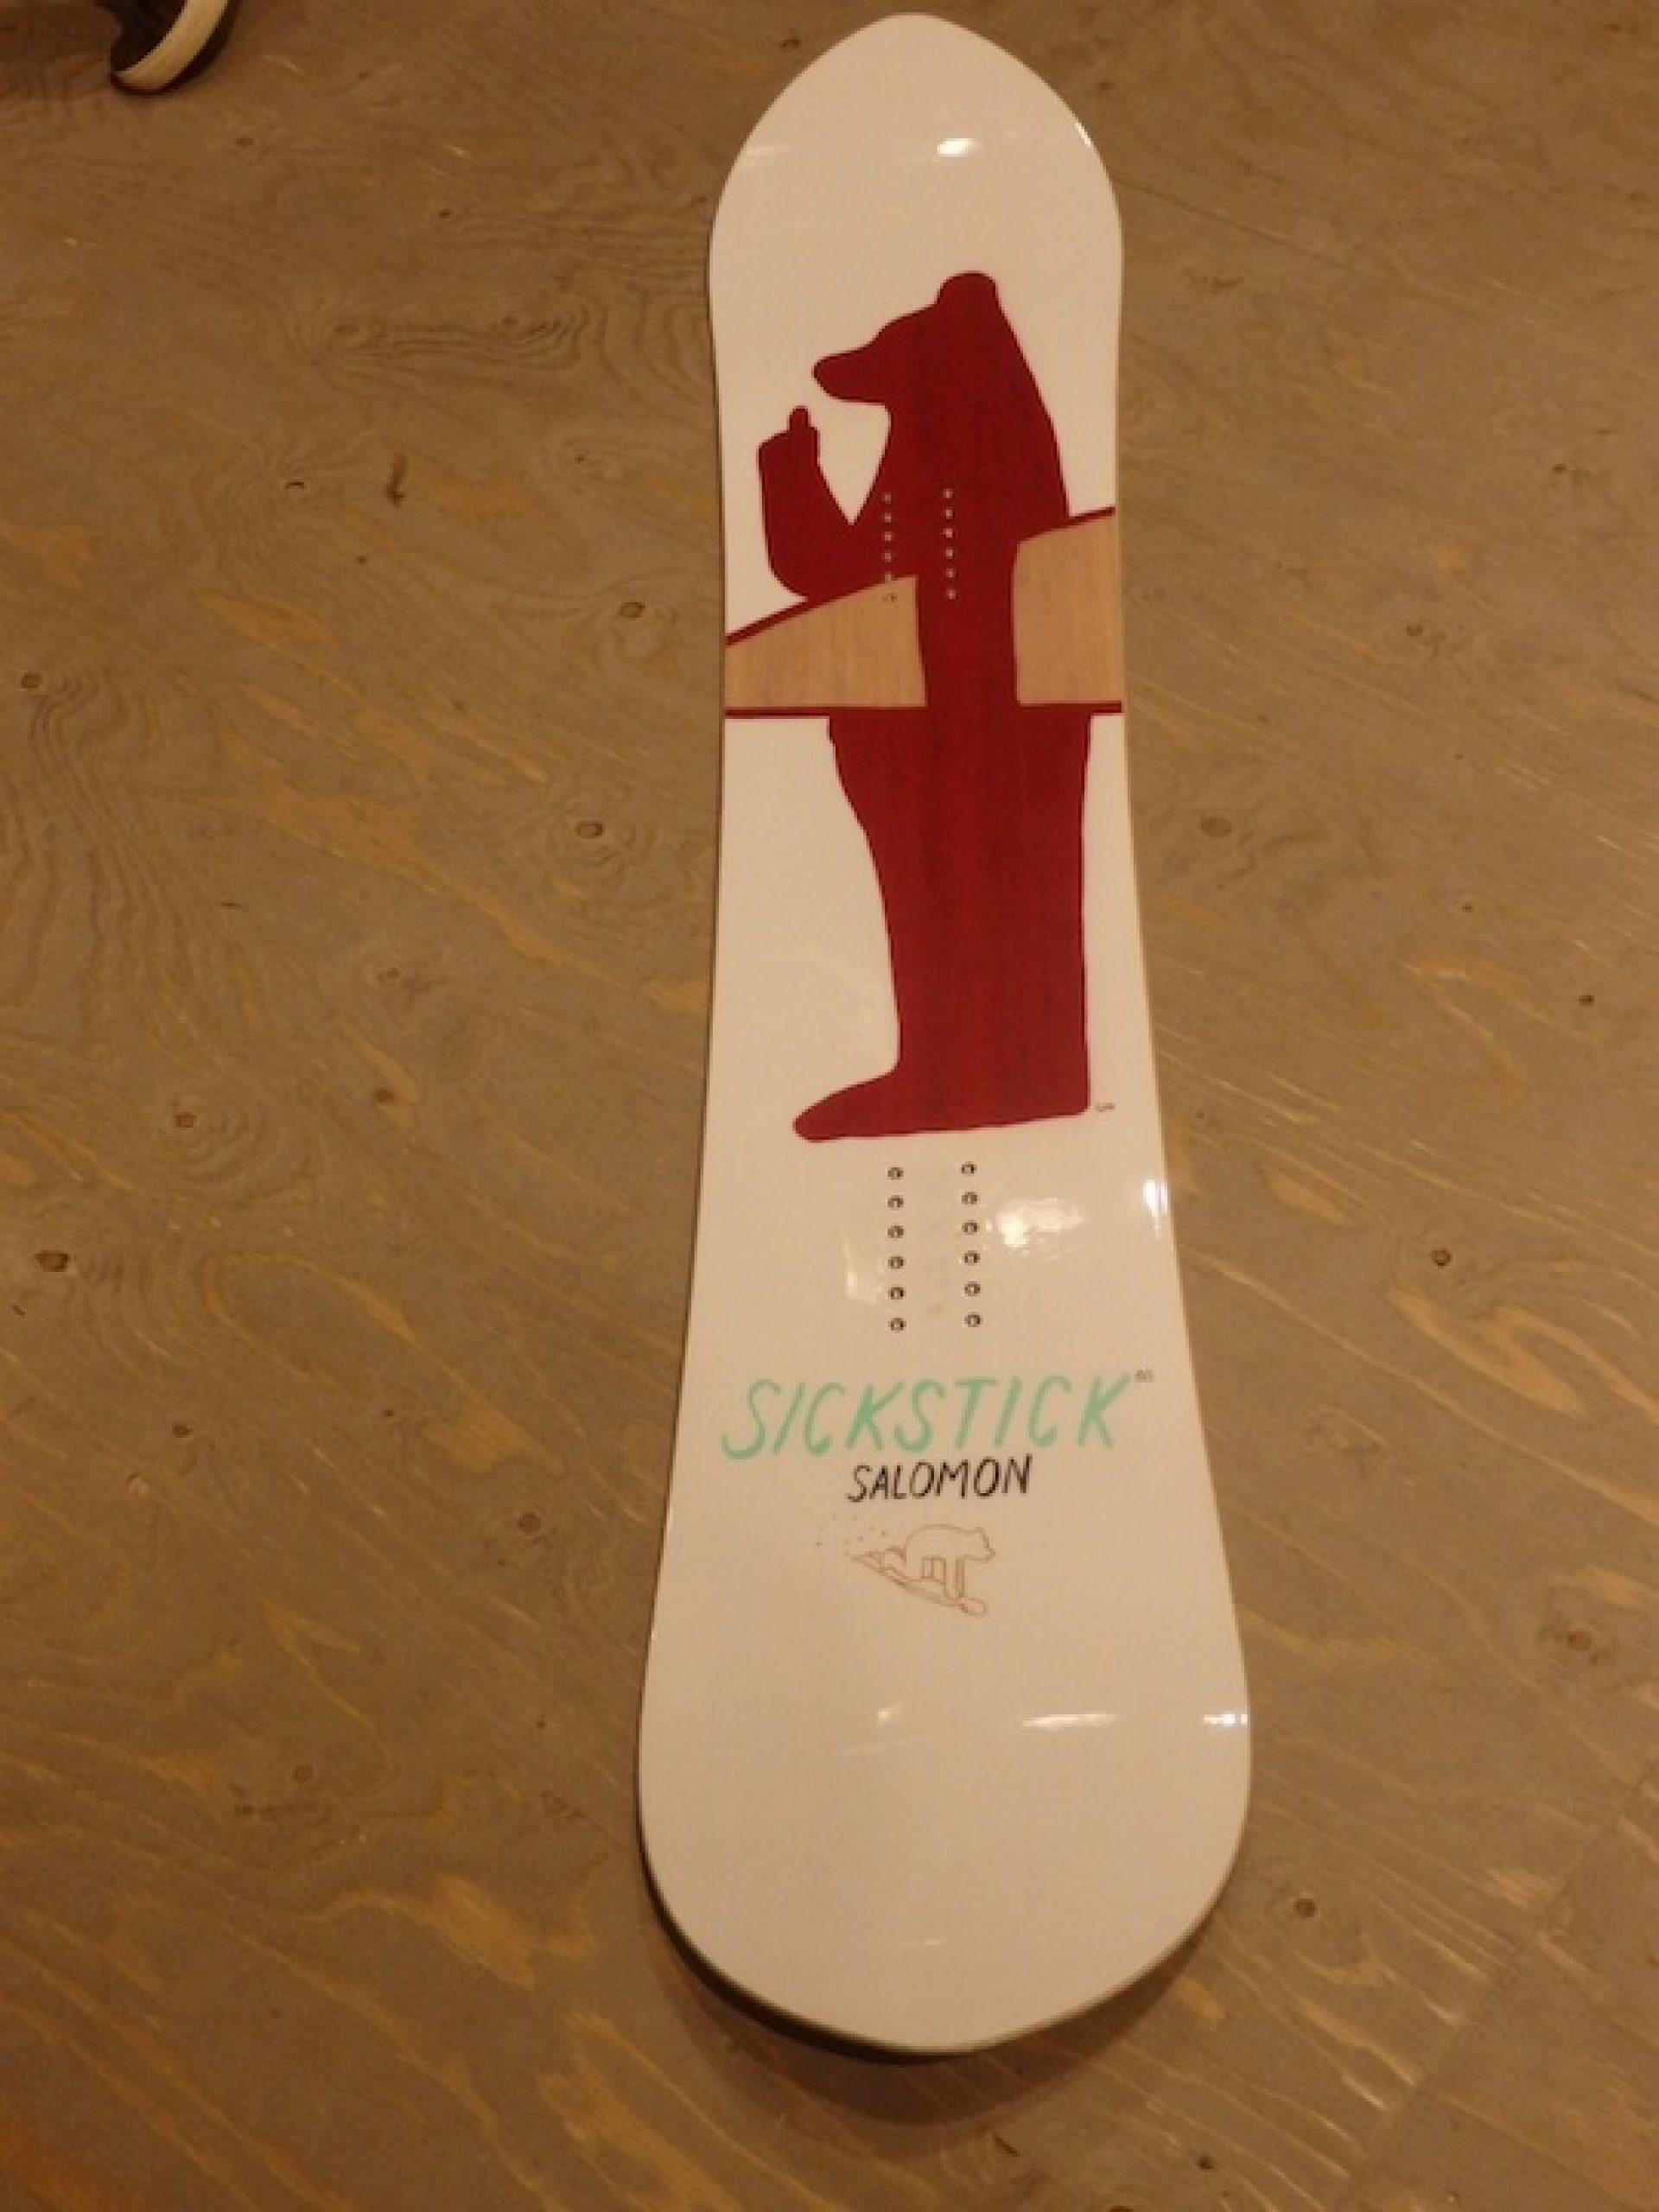 b3c787de8f2 Salomon s SIck Stick old style powder board with the bear graphic